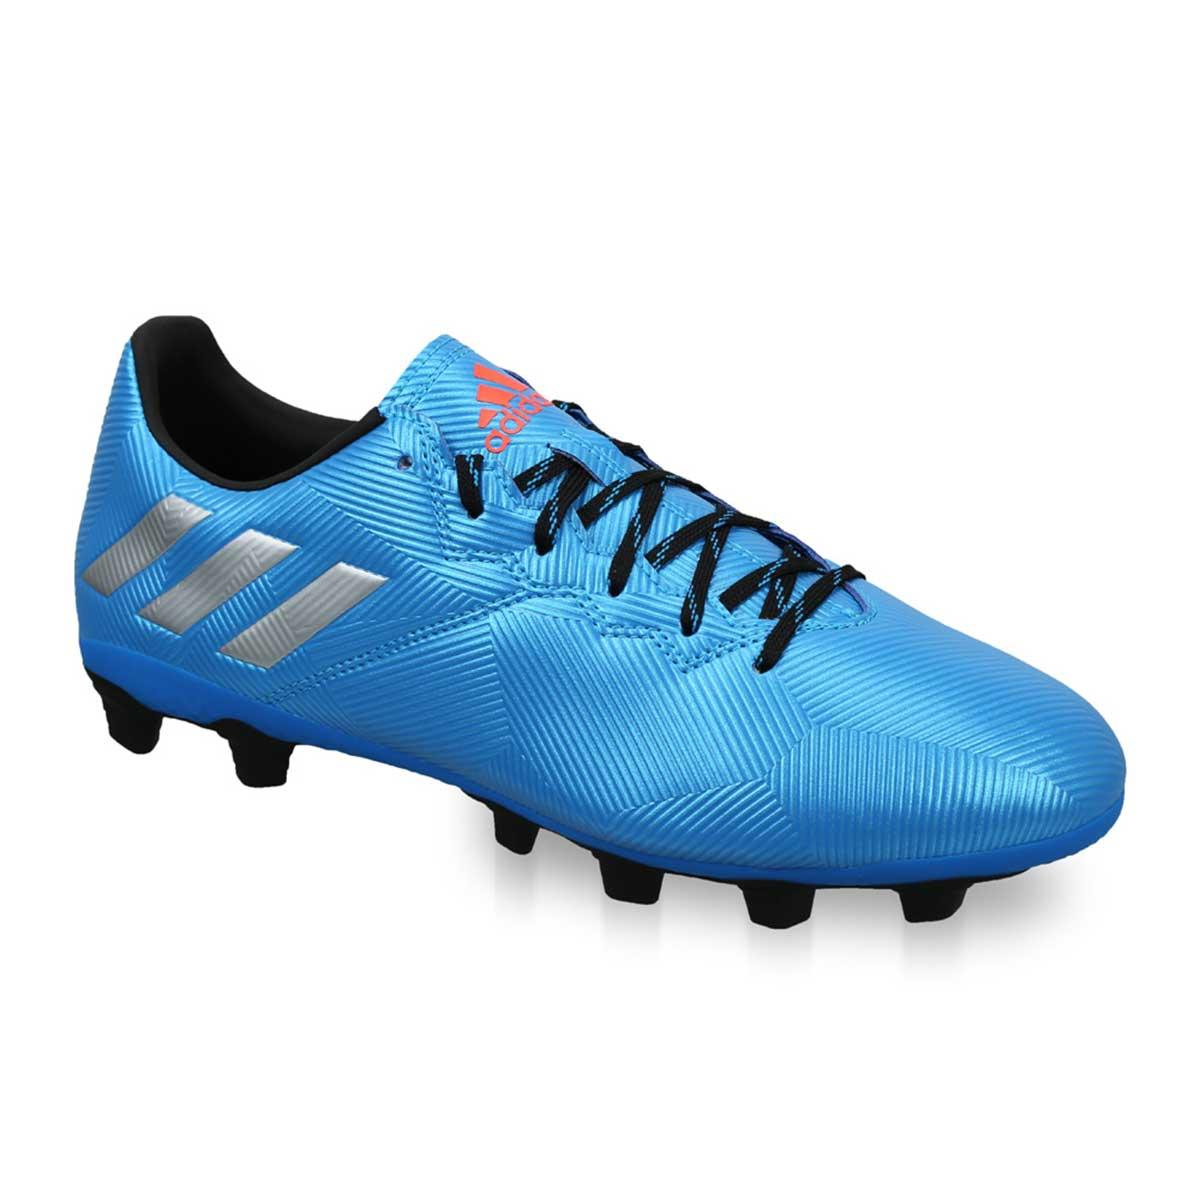 taller Duquesa servilleta  Buy Adidas Messi 16.4 FXG Football Shoes (Blue/Silver/Black) Online